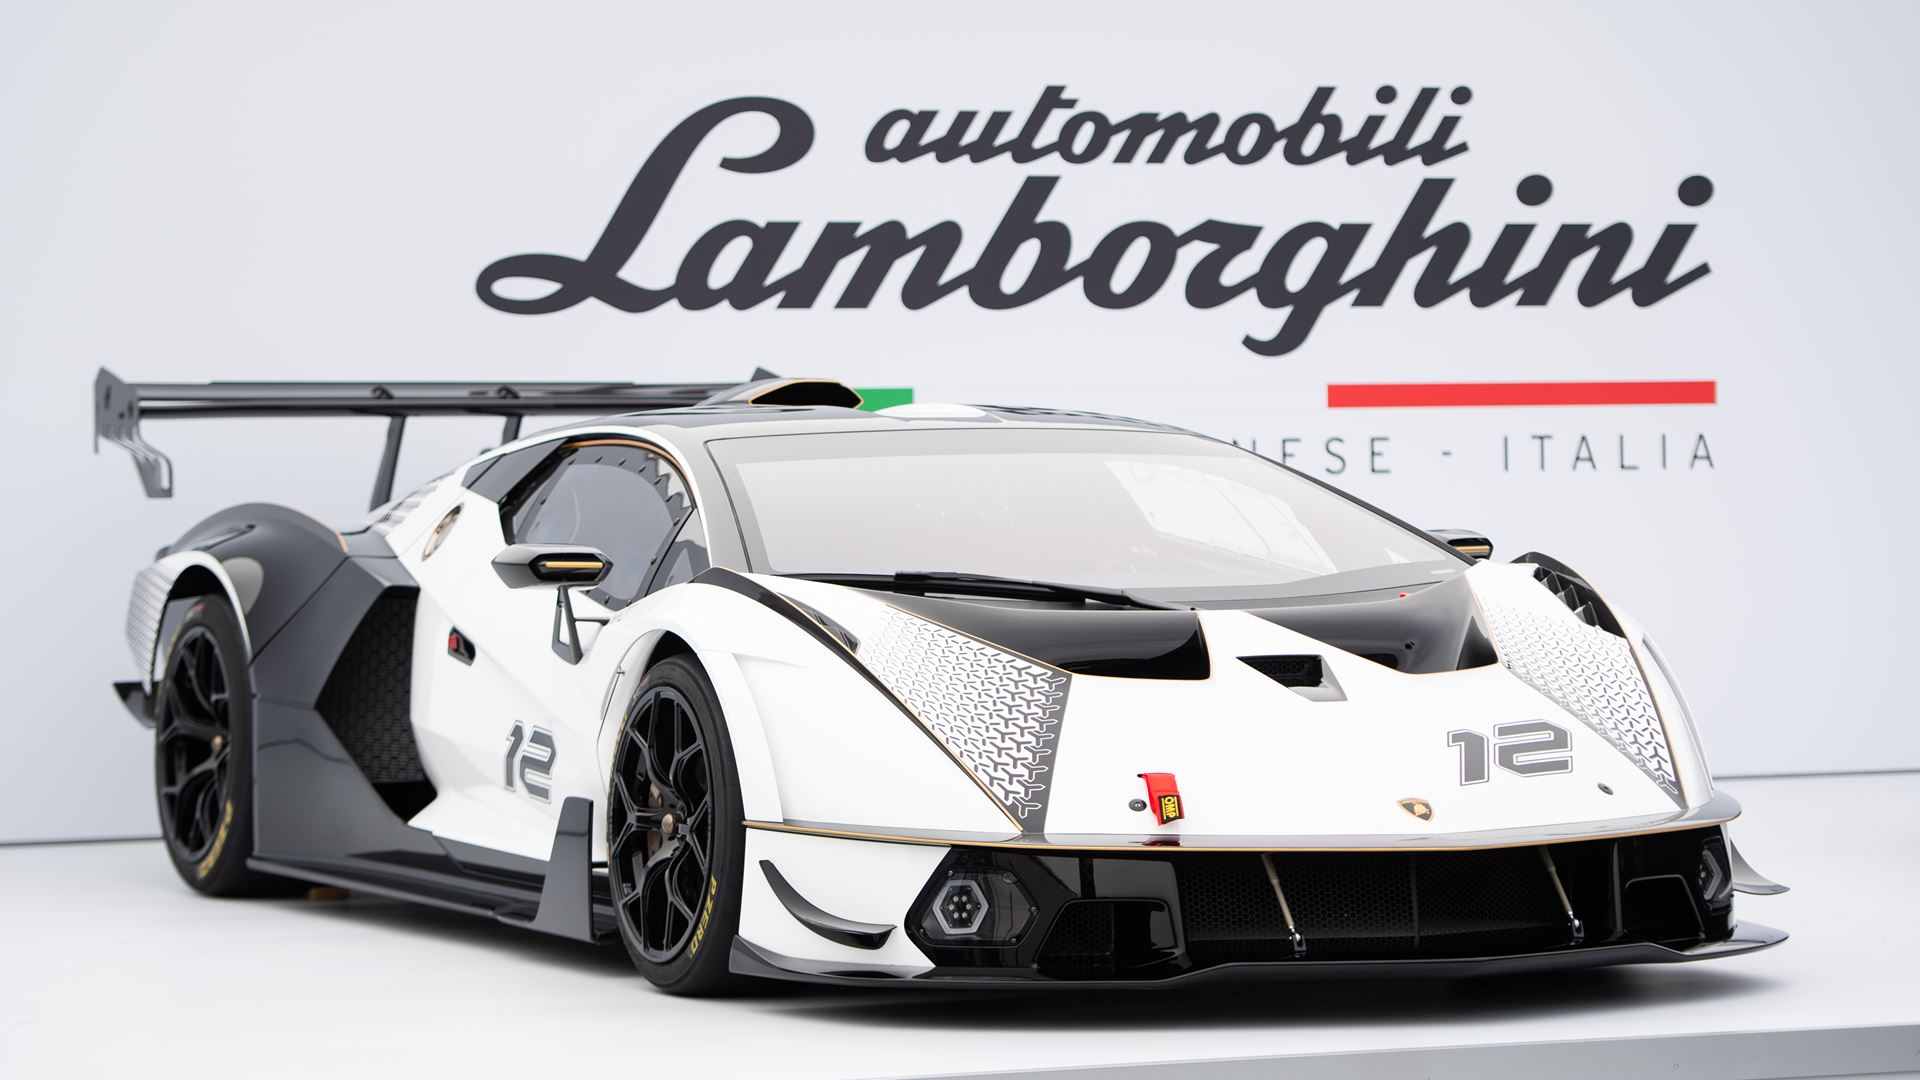 Lamborghini Kicks Off Monterey Car Week with Countach LPI 800-4 Global Debut at The Quail, A Motorsports Gathering - Image 4